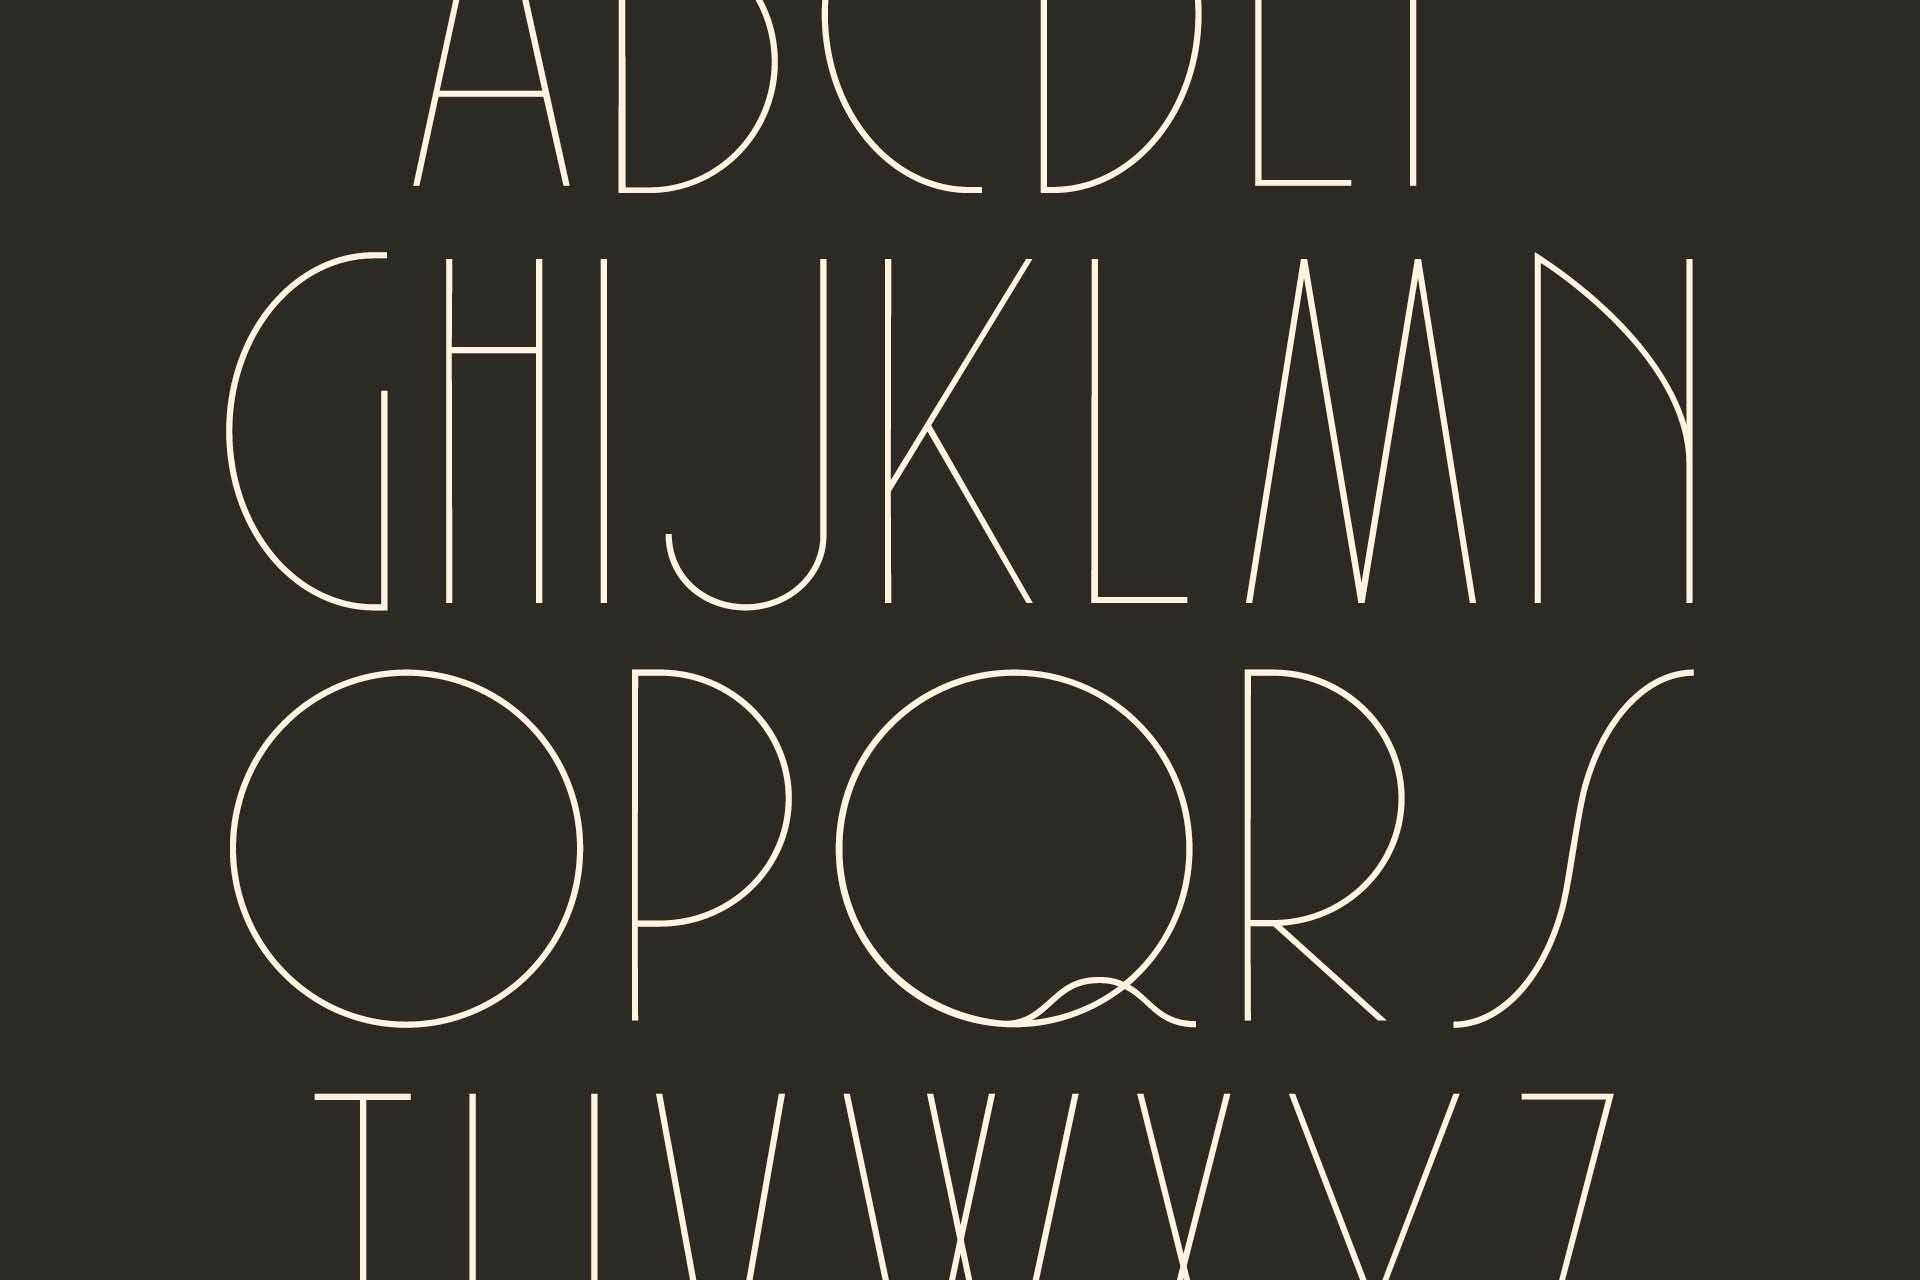 Typographie art déco